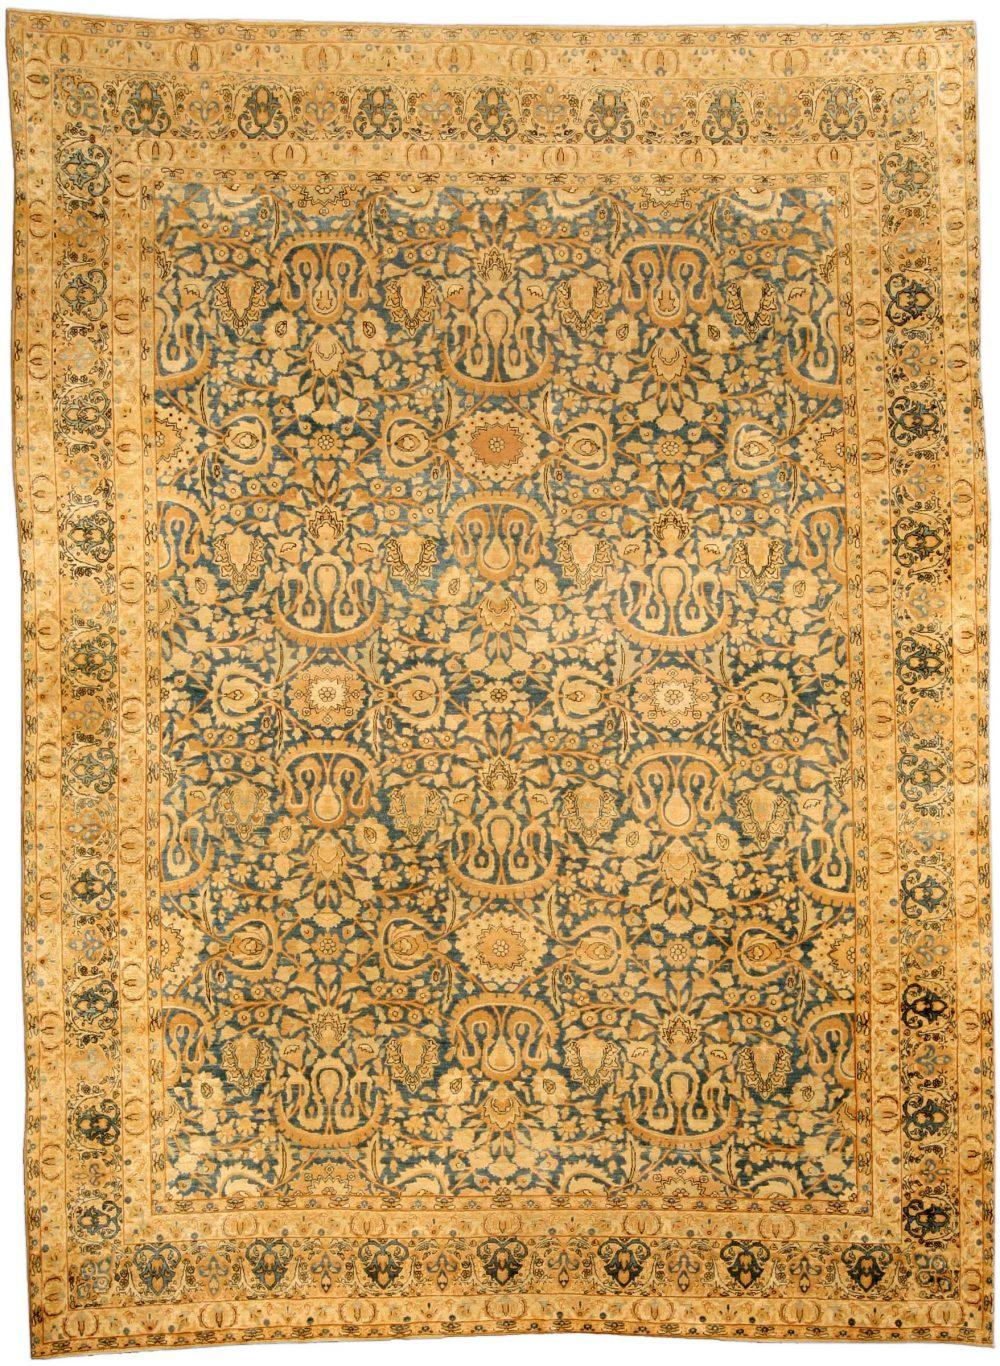 Antique Persian Kirman Rug BB3763